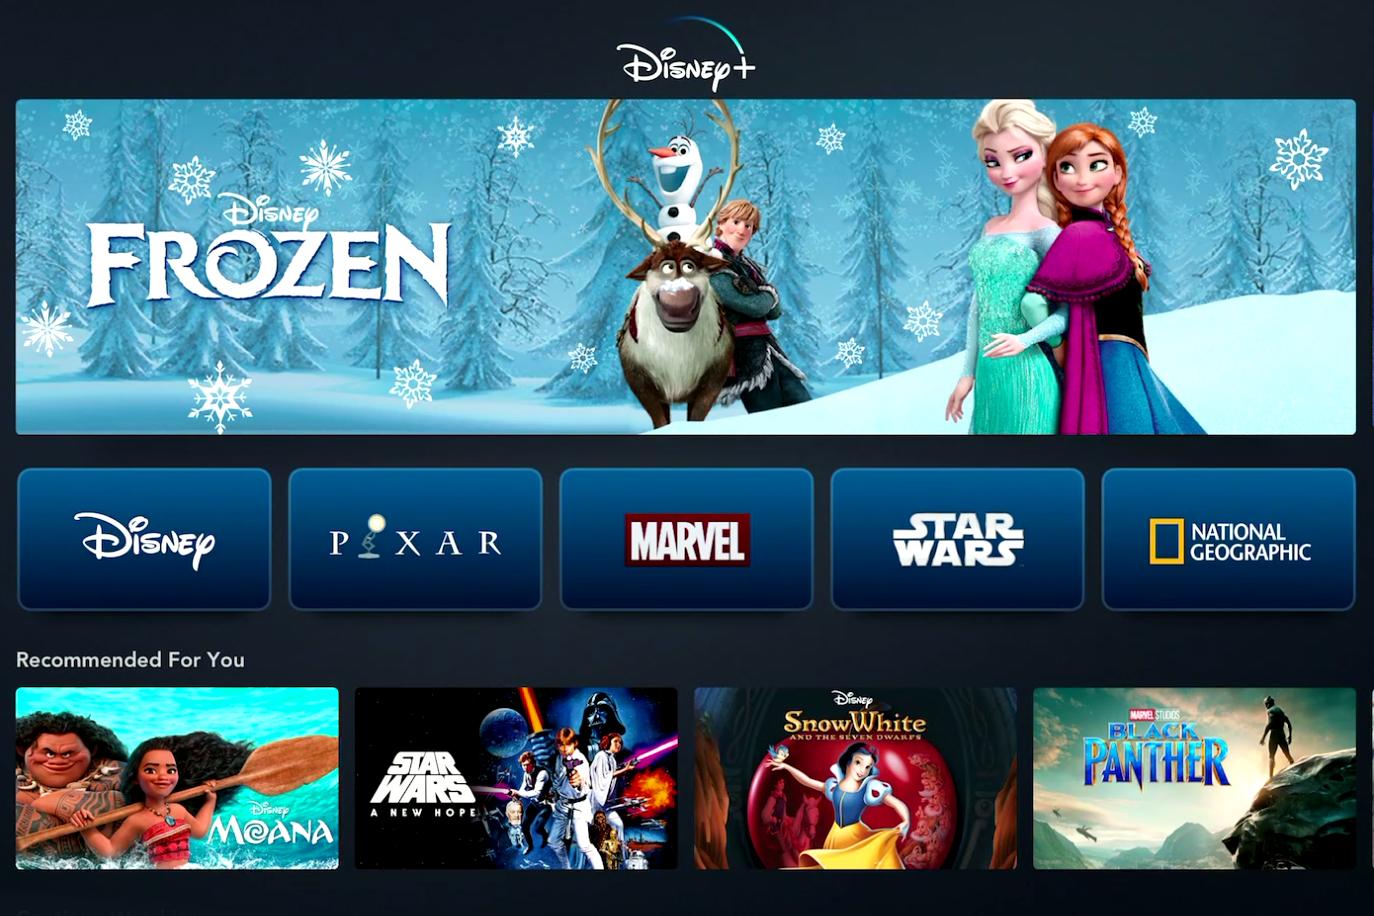 Walt Disney Co. unveils its new streaming service, Disney+